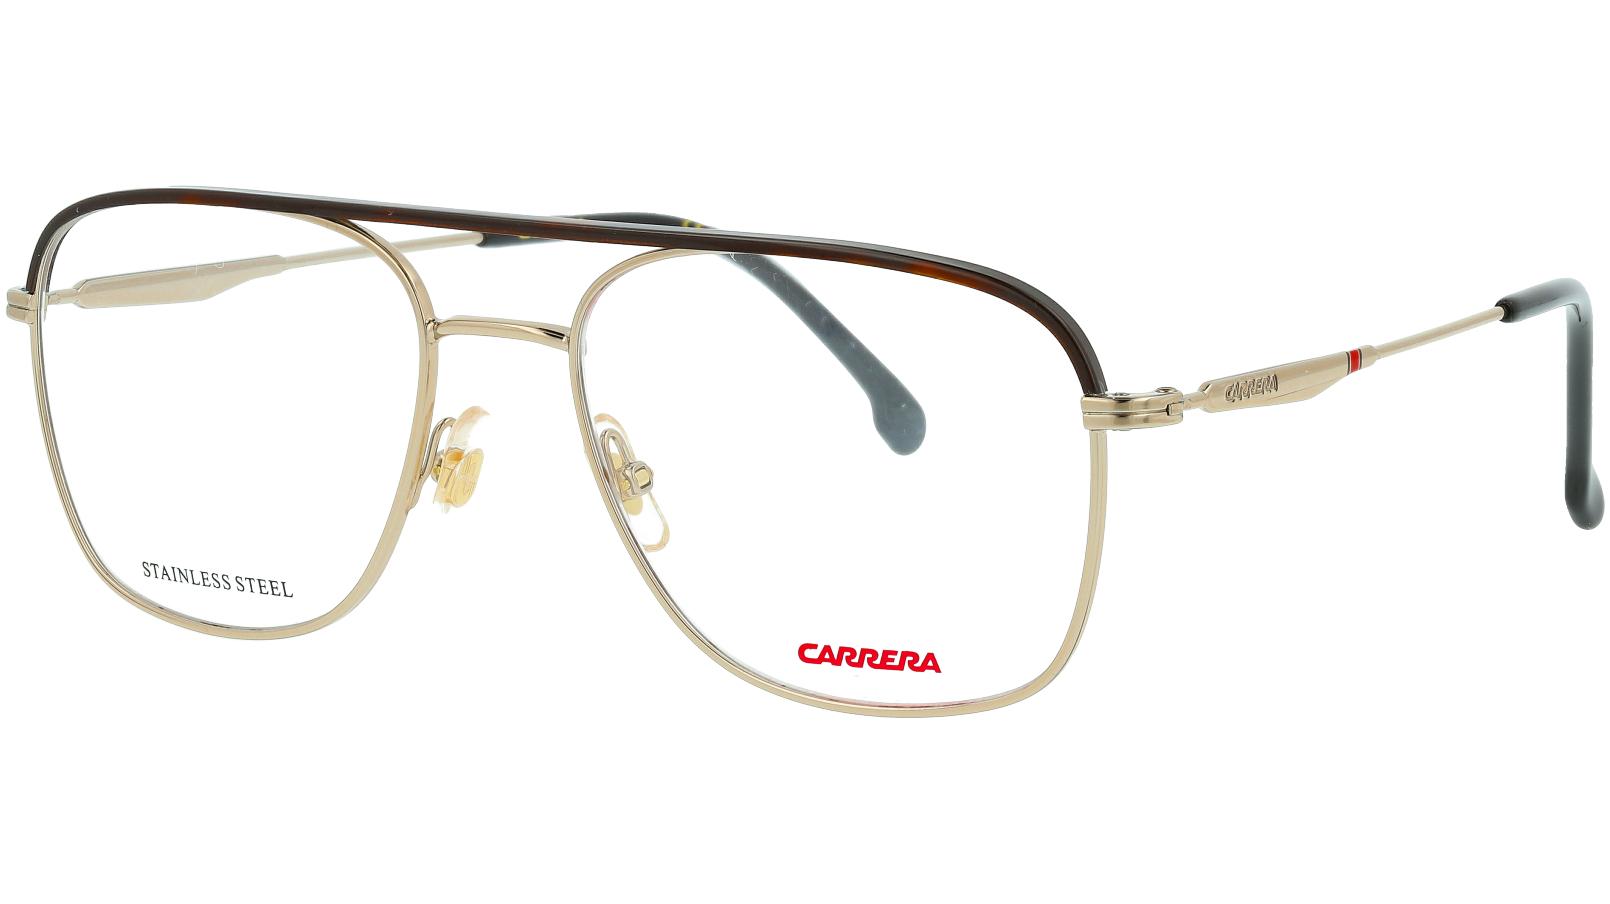 Carrera 211 3YG 54 LIGHT Glasses